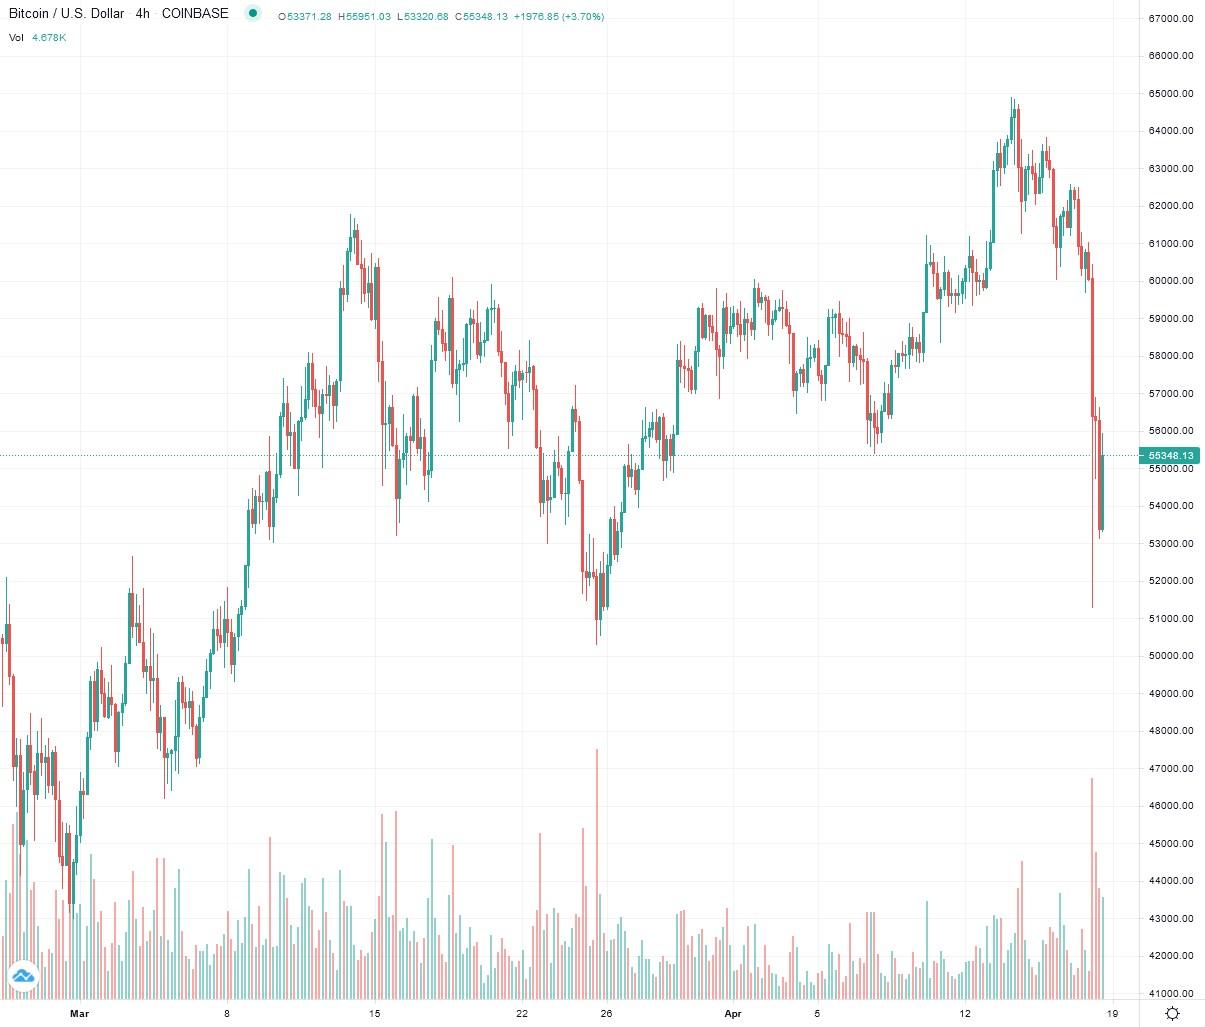 2021-04-18_17__11_tradingview_chart_widget.jpg